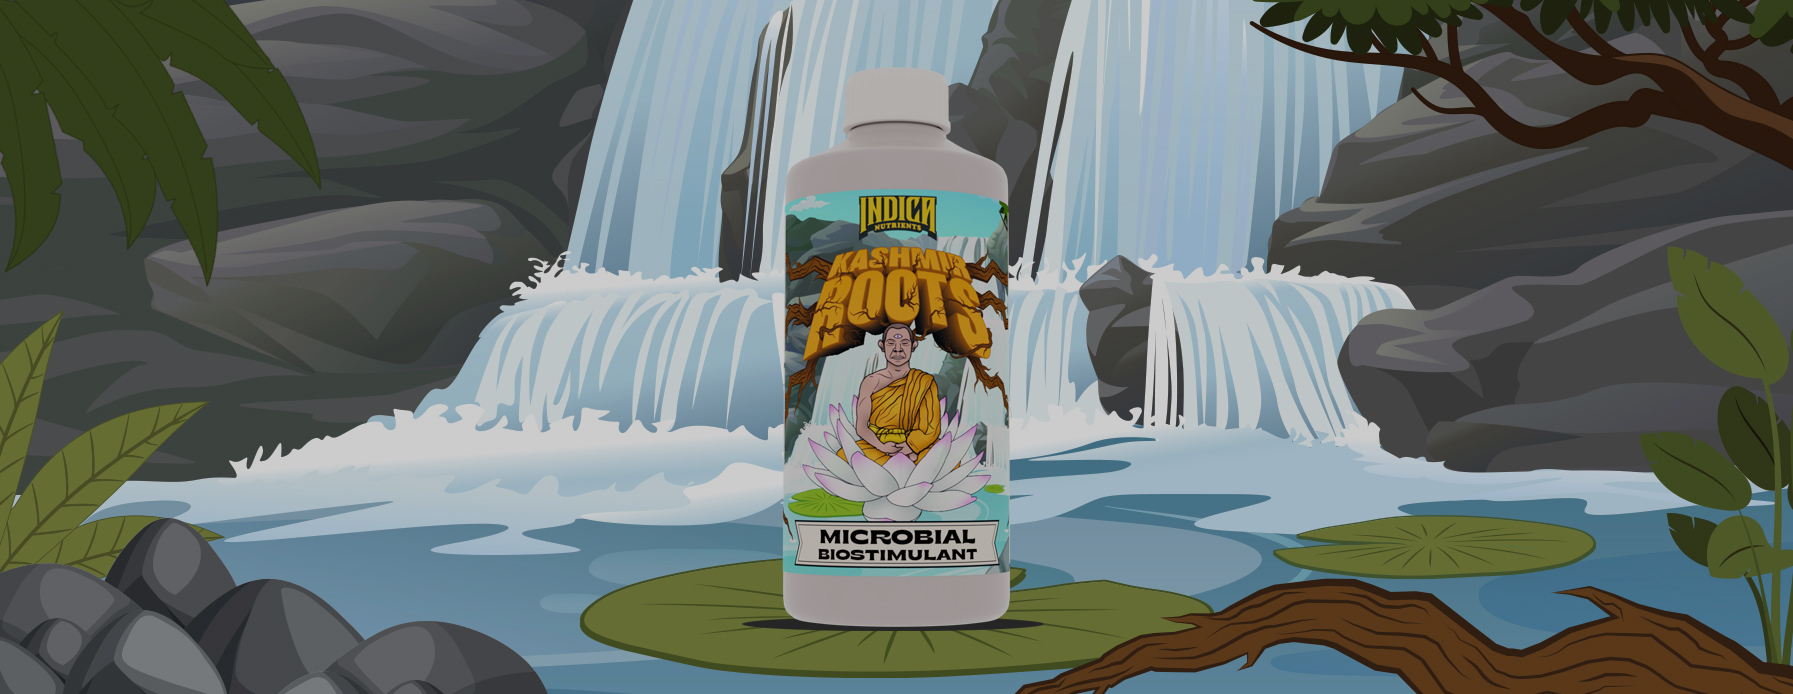 POWERFUL MICROBIAL STIMULANT